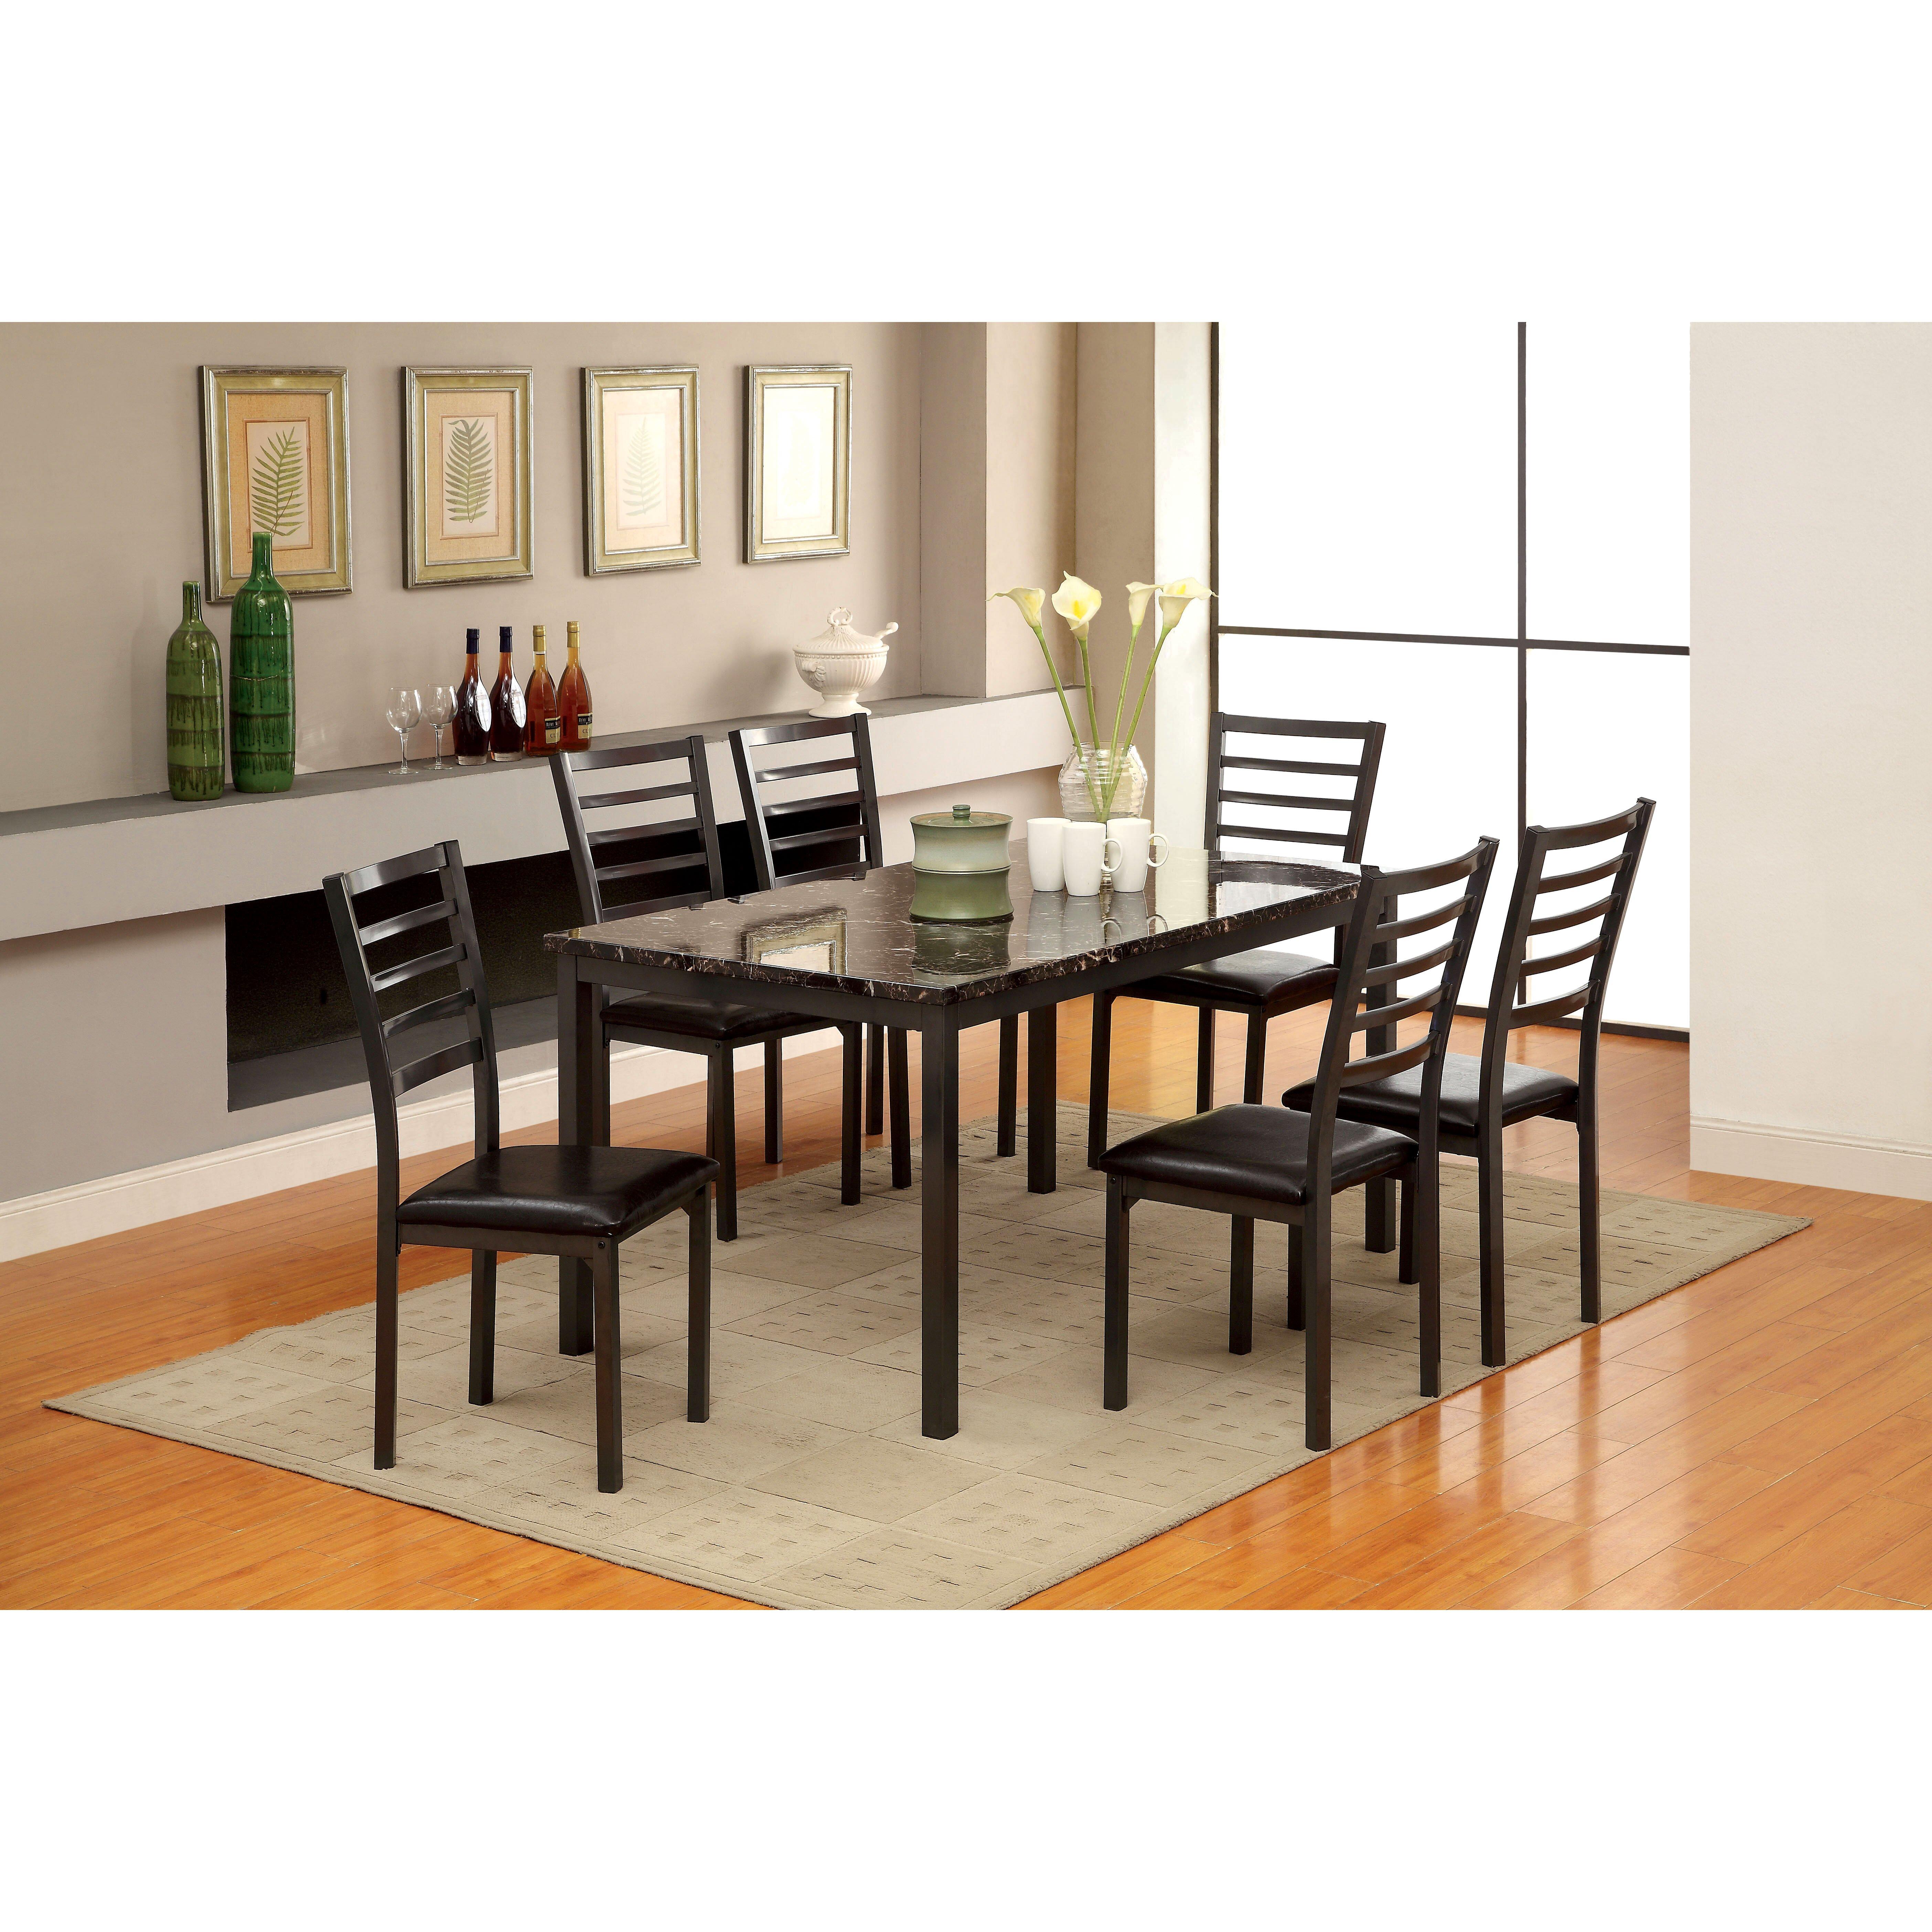 Hokku designs cramer dining table reviews for Hokku designs dining room furniture